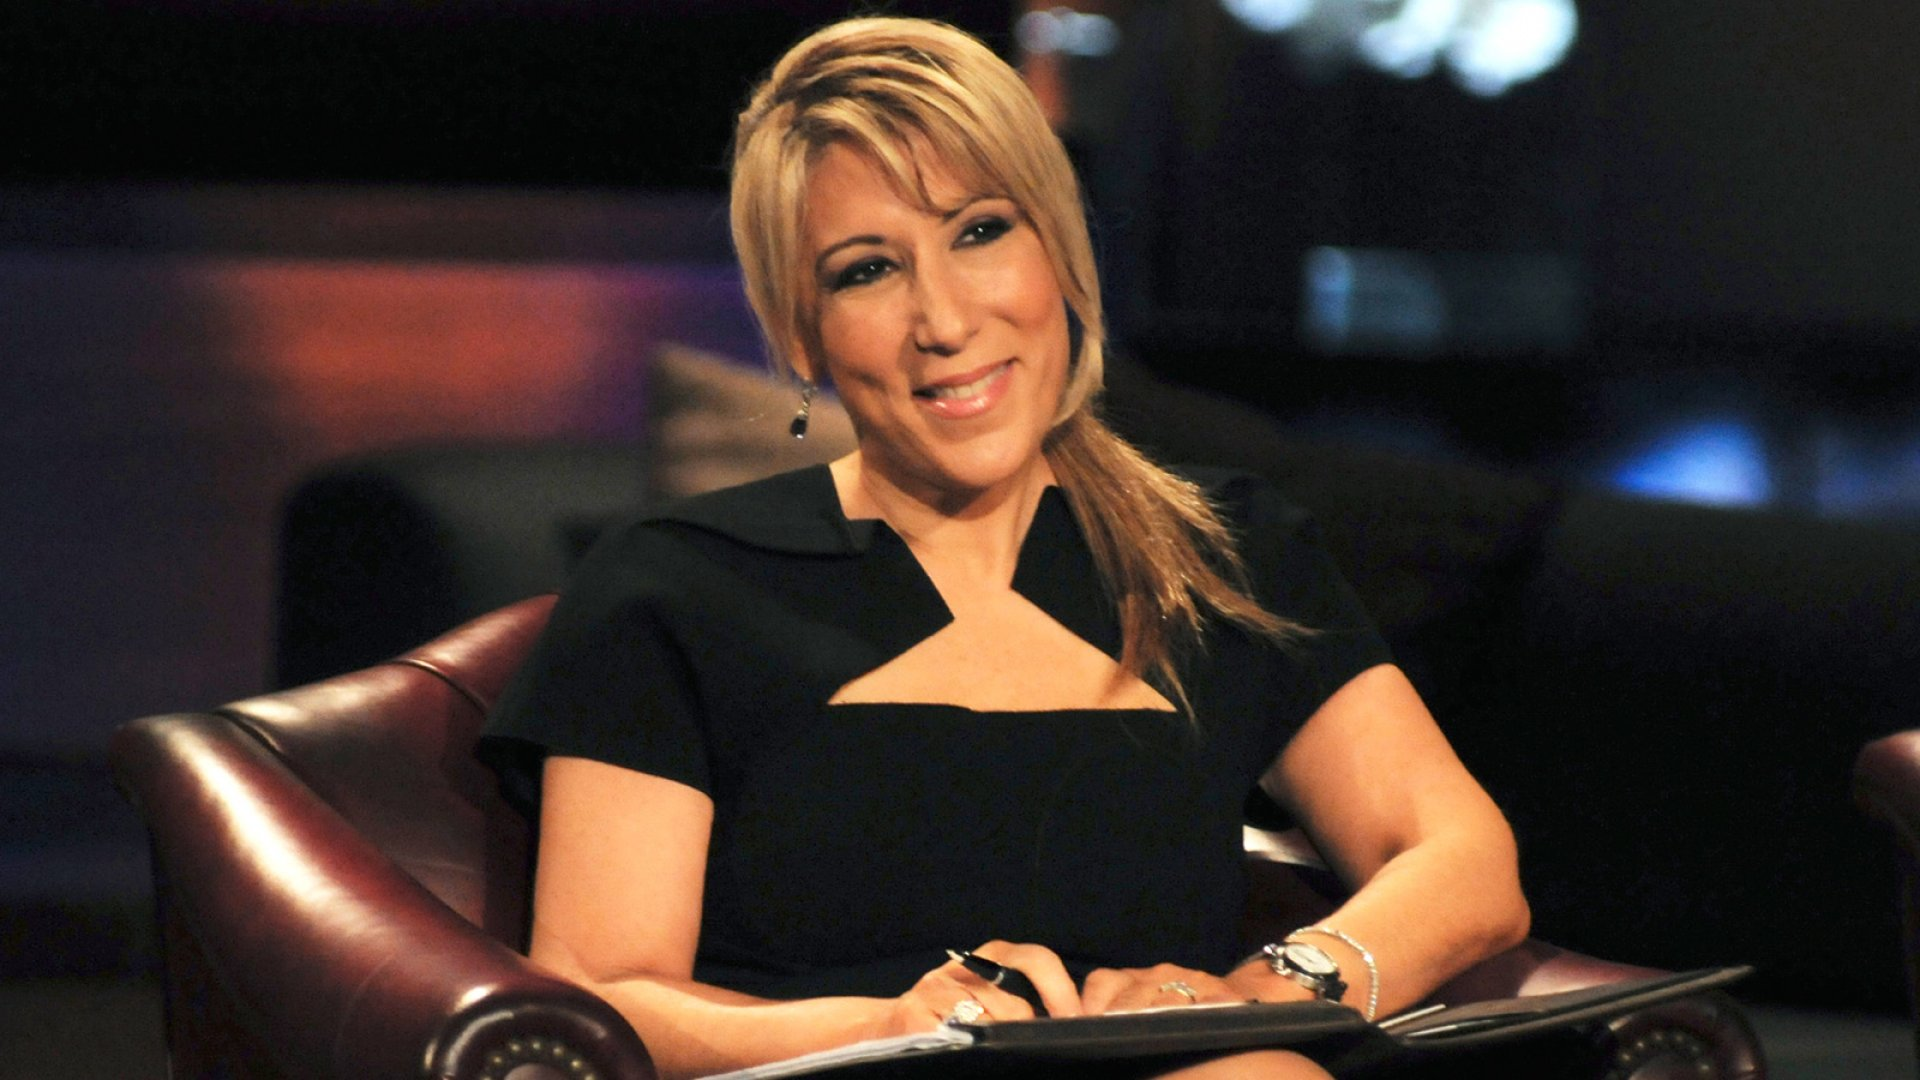 How Shark Tank's Lori Greiner Spots a Million-Dollar Business Idea